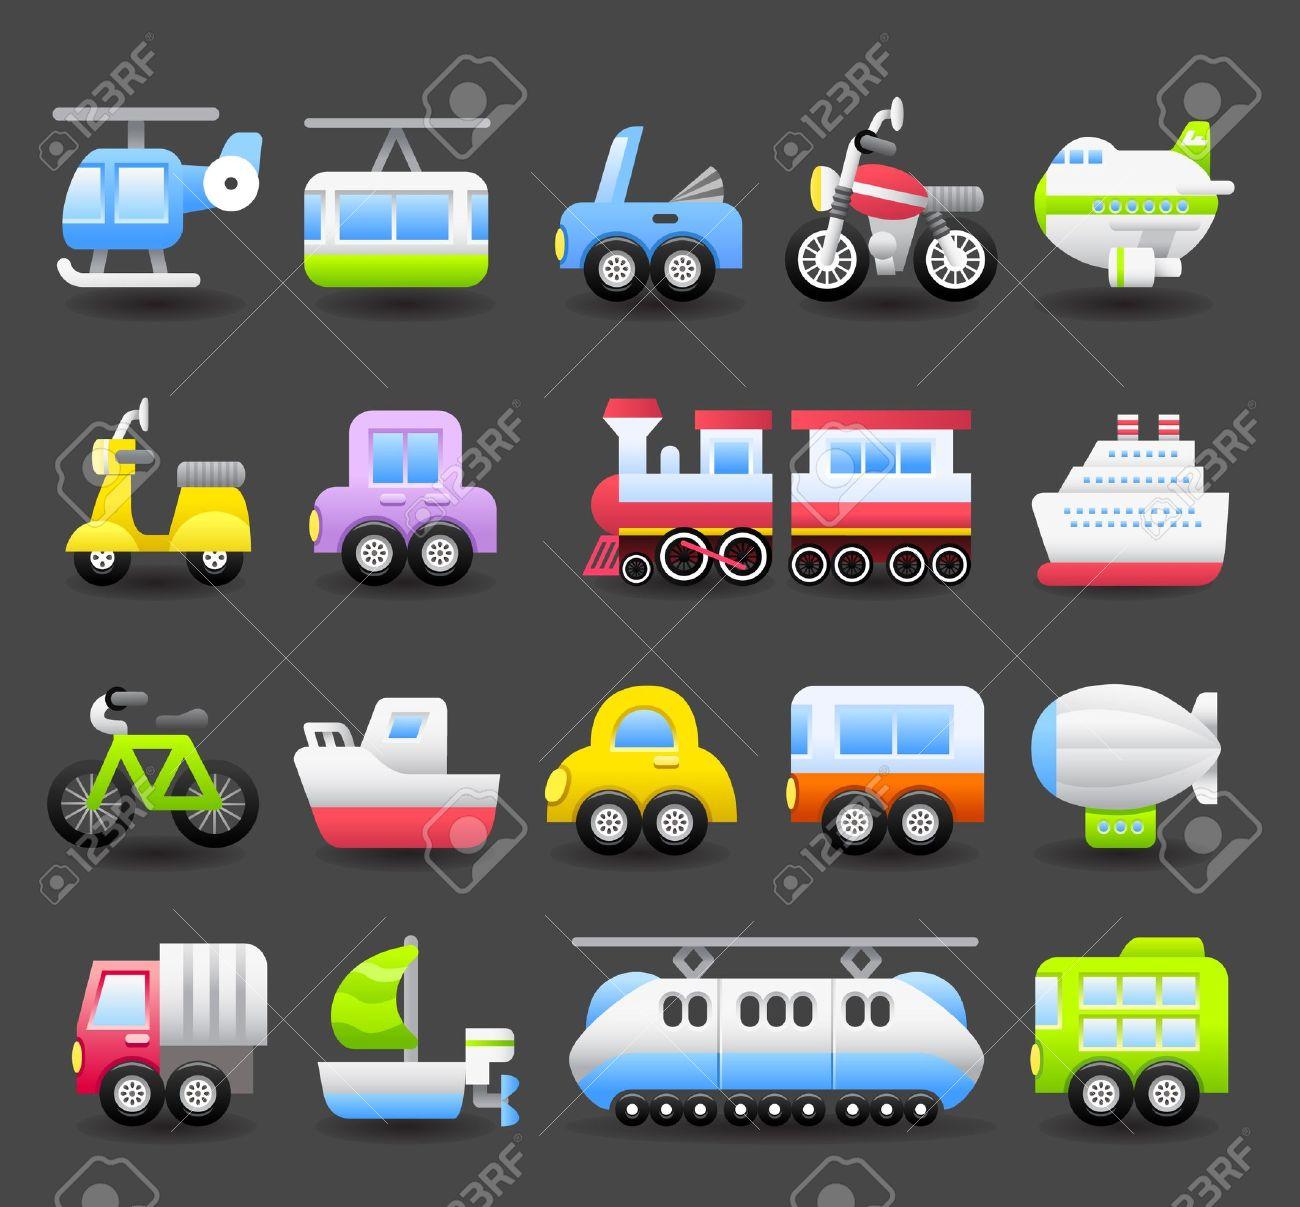 cartoon car,vehicle icon set - 10556183